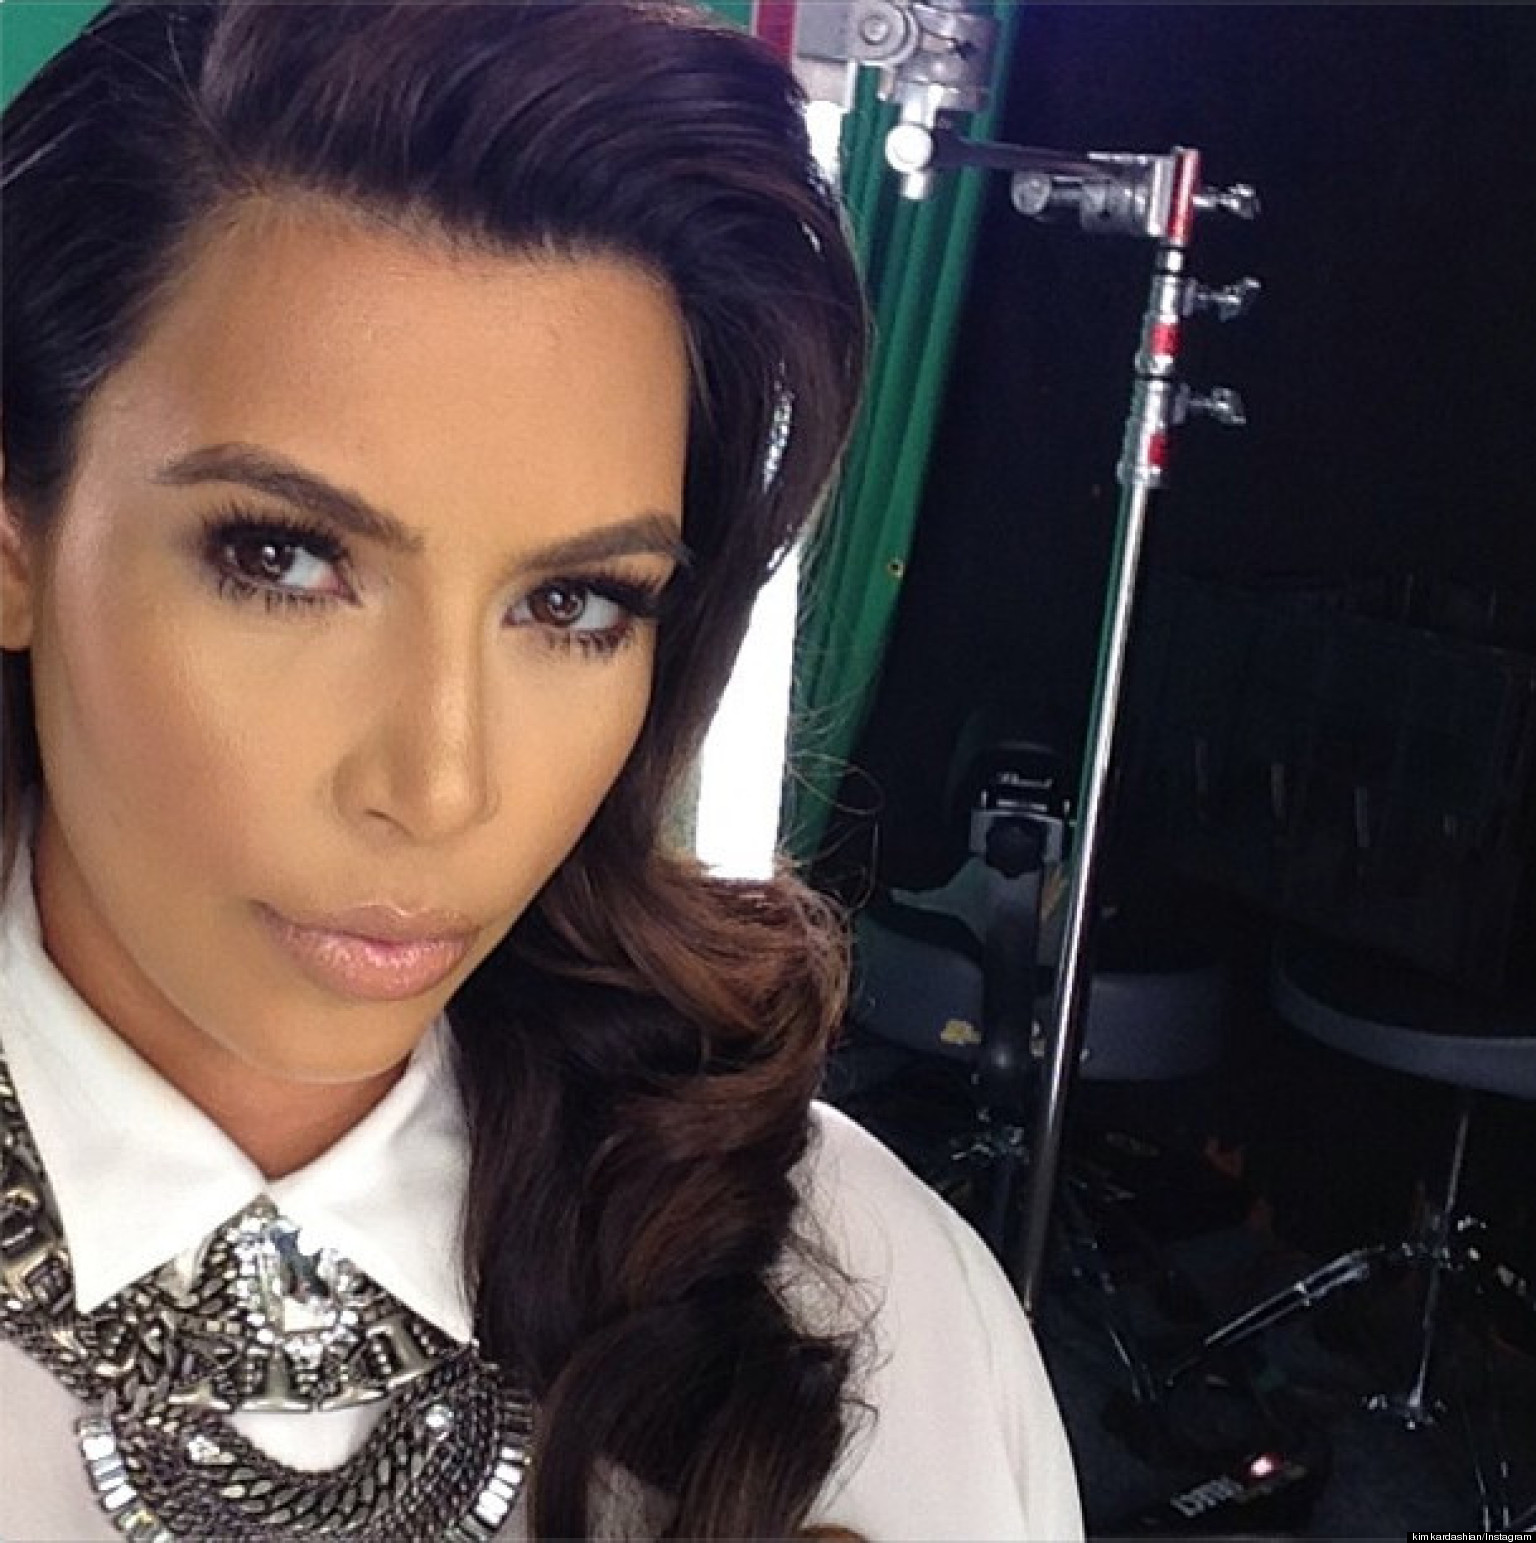 Kim Kardashian Posts Twitter Rant About Privacy, Selfies ...